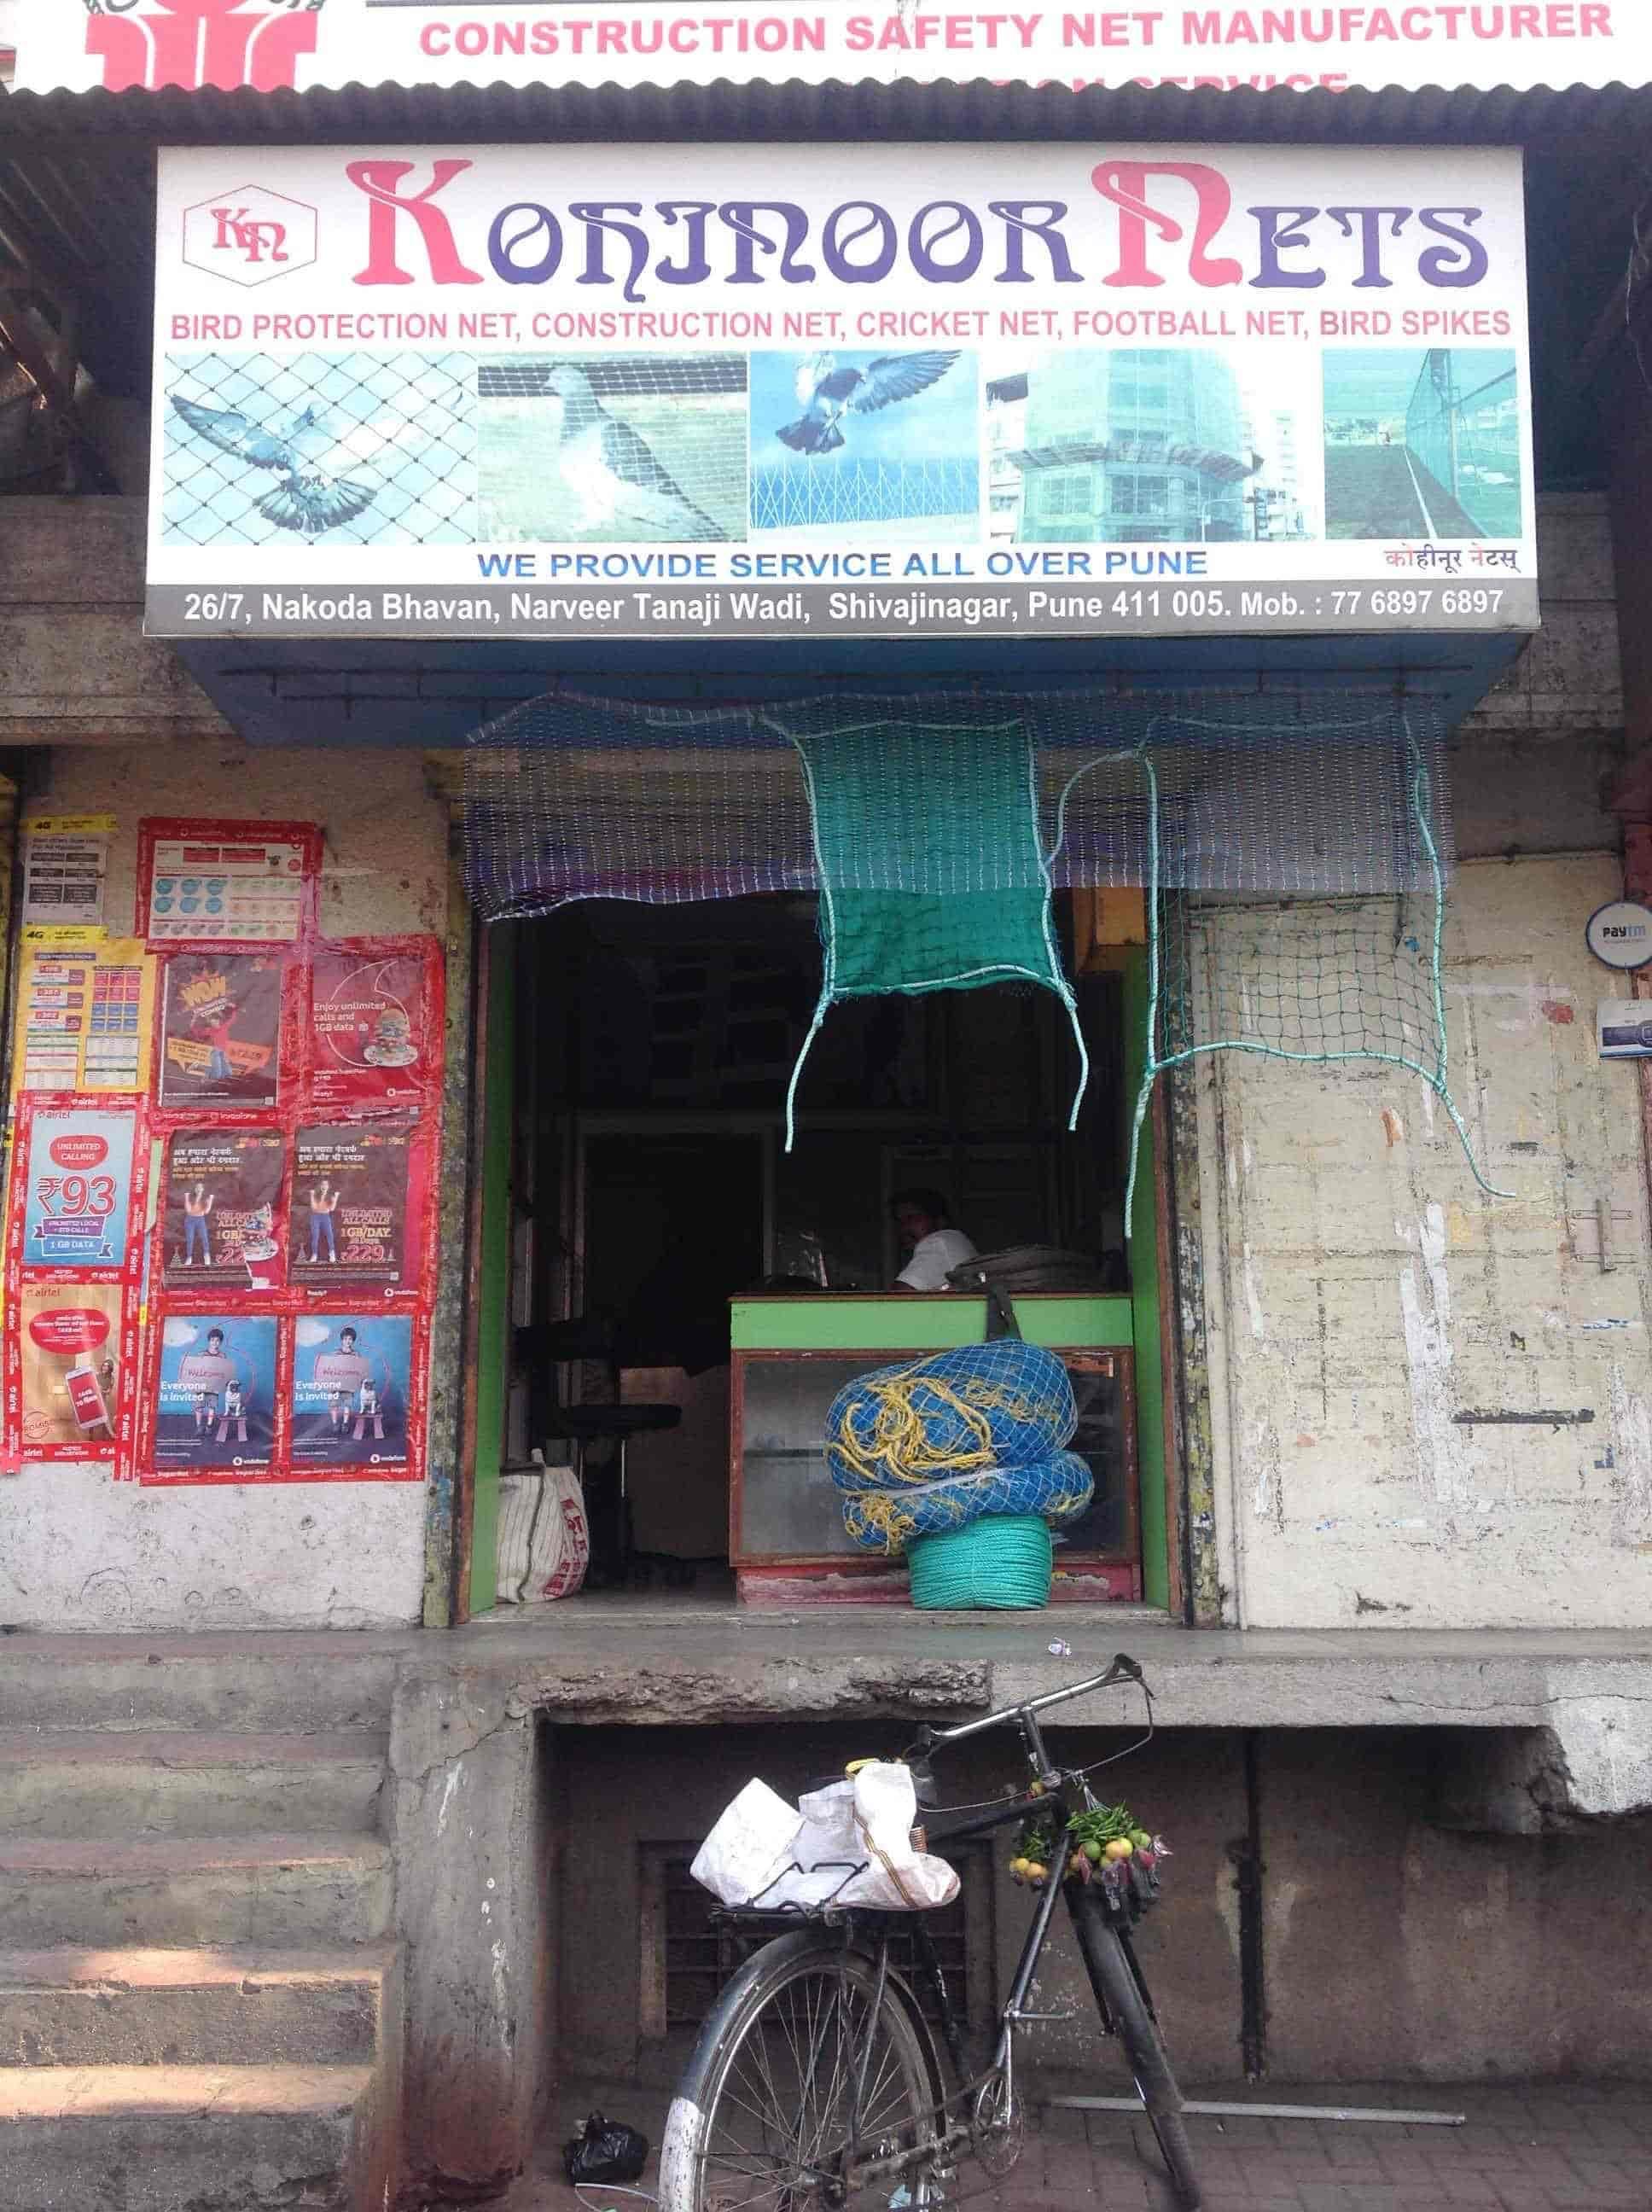 Top 50 Bird Spike Dealers in Raviwar Peth - Best Pigeon